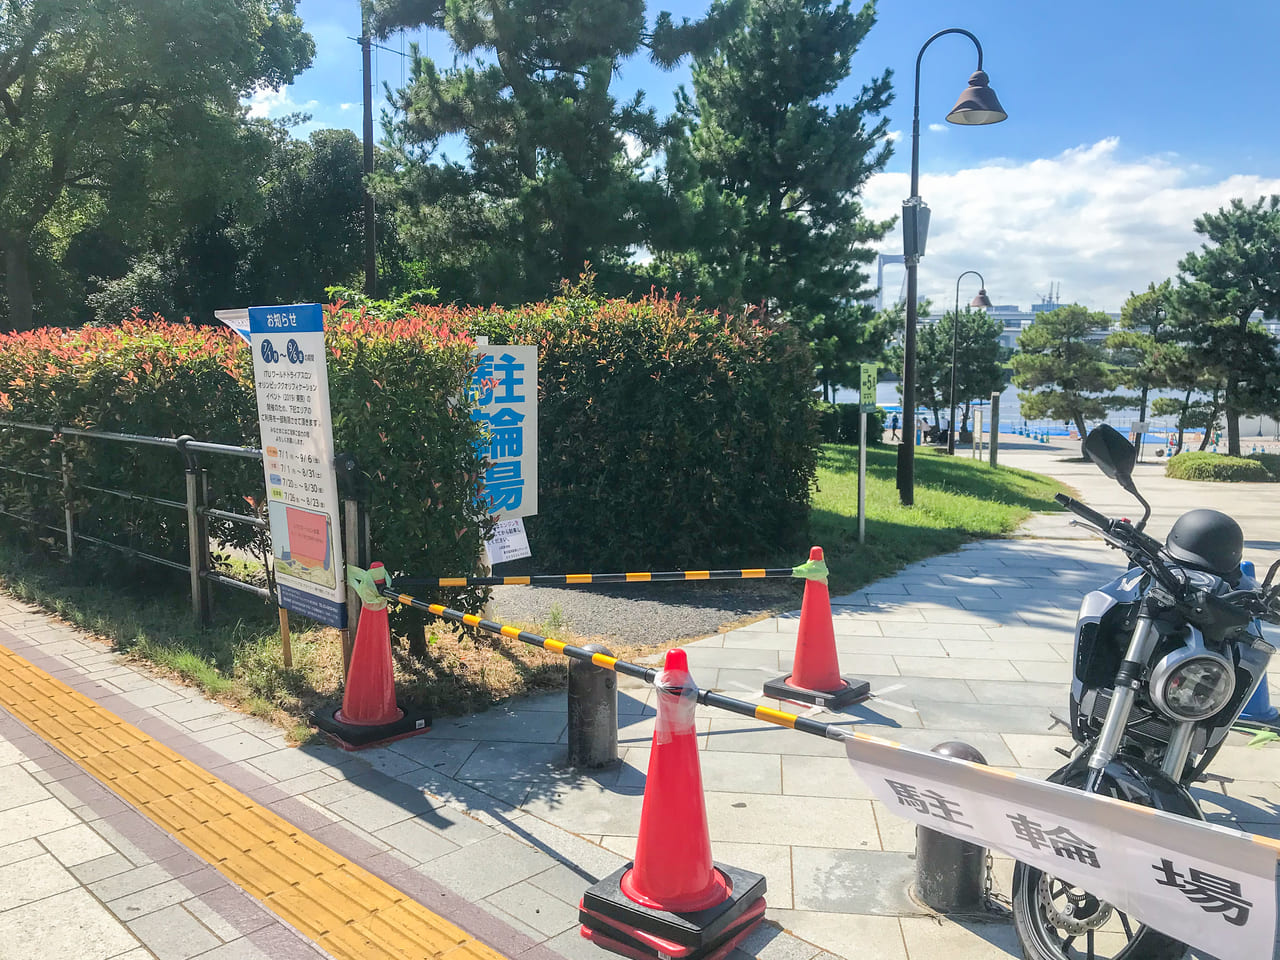 /1261-odaiba-seaside-park-motorcycle-bicycle-parking